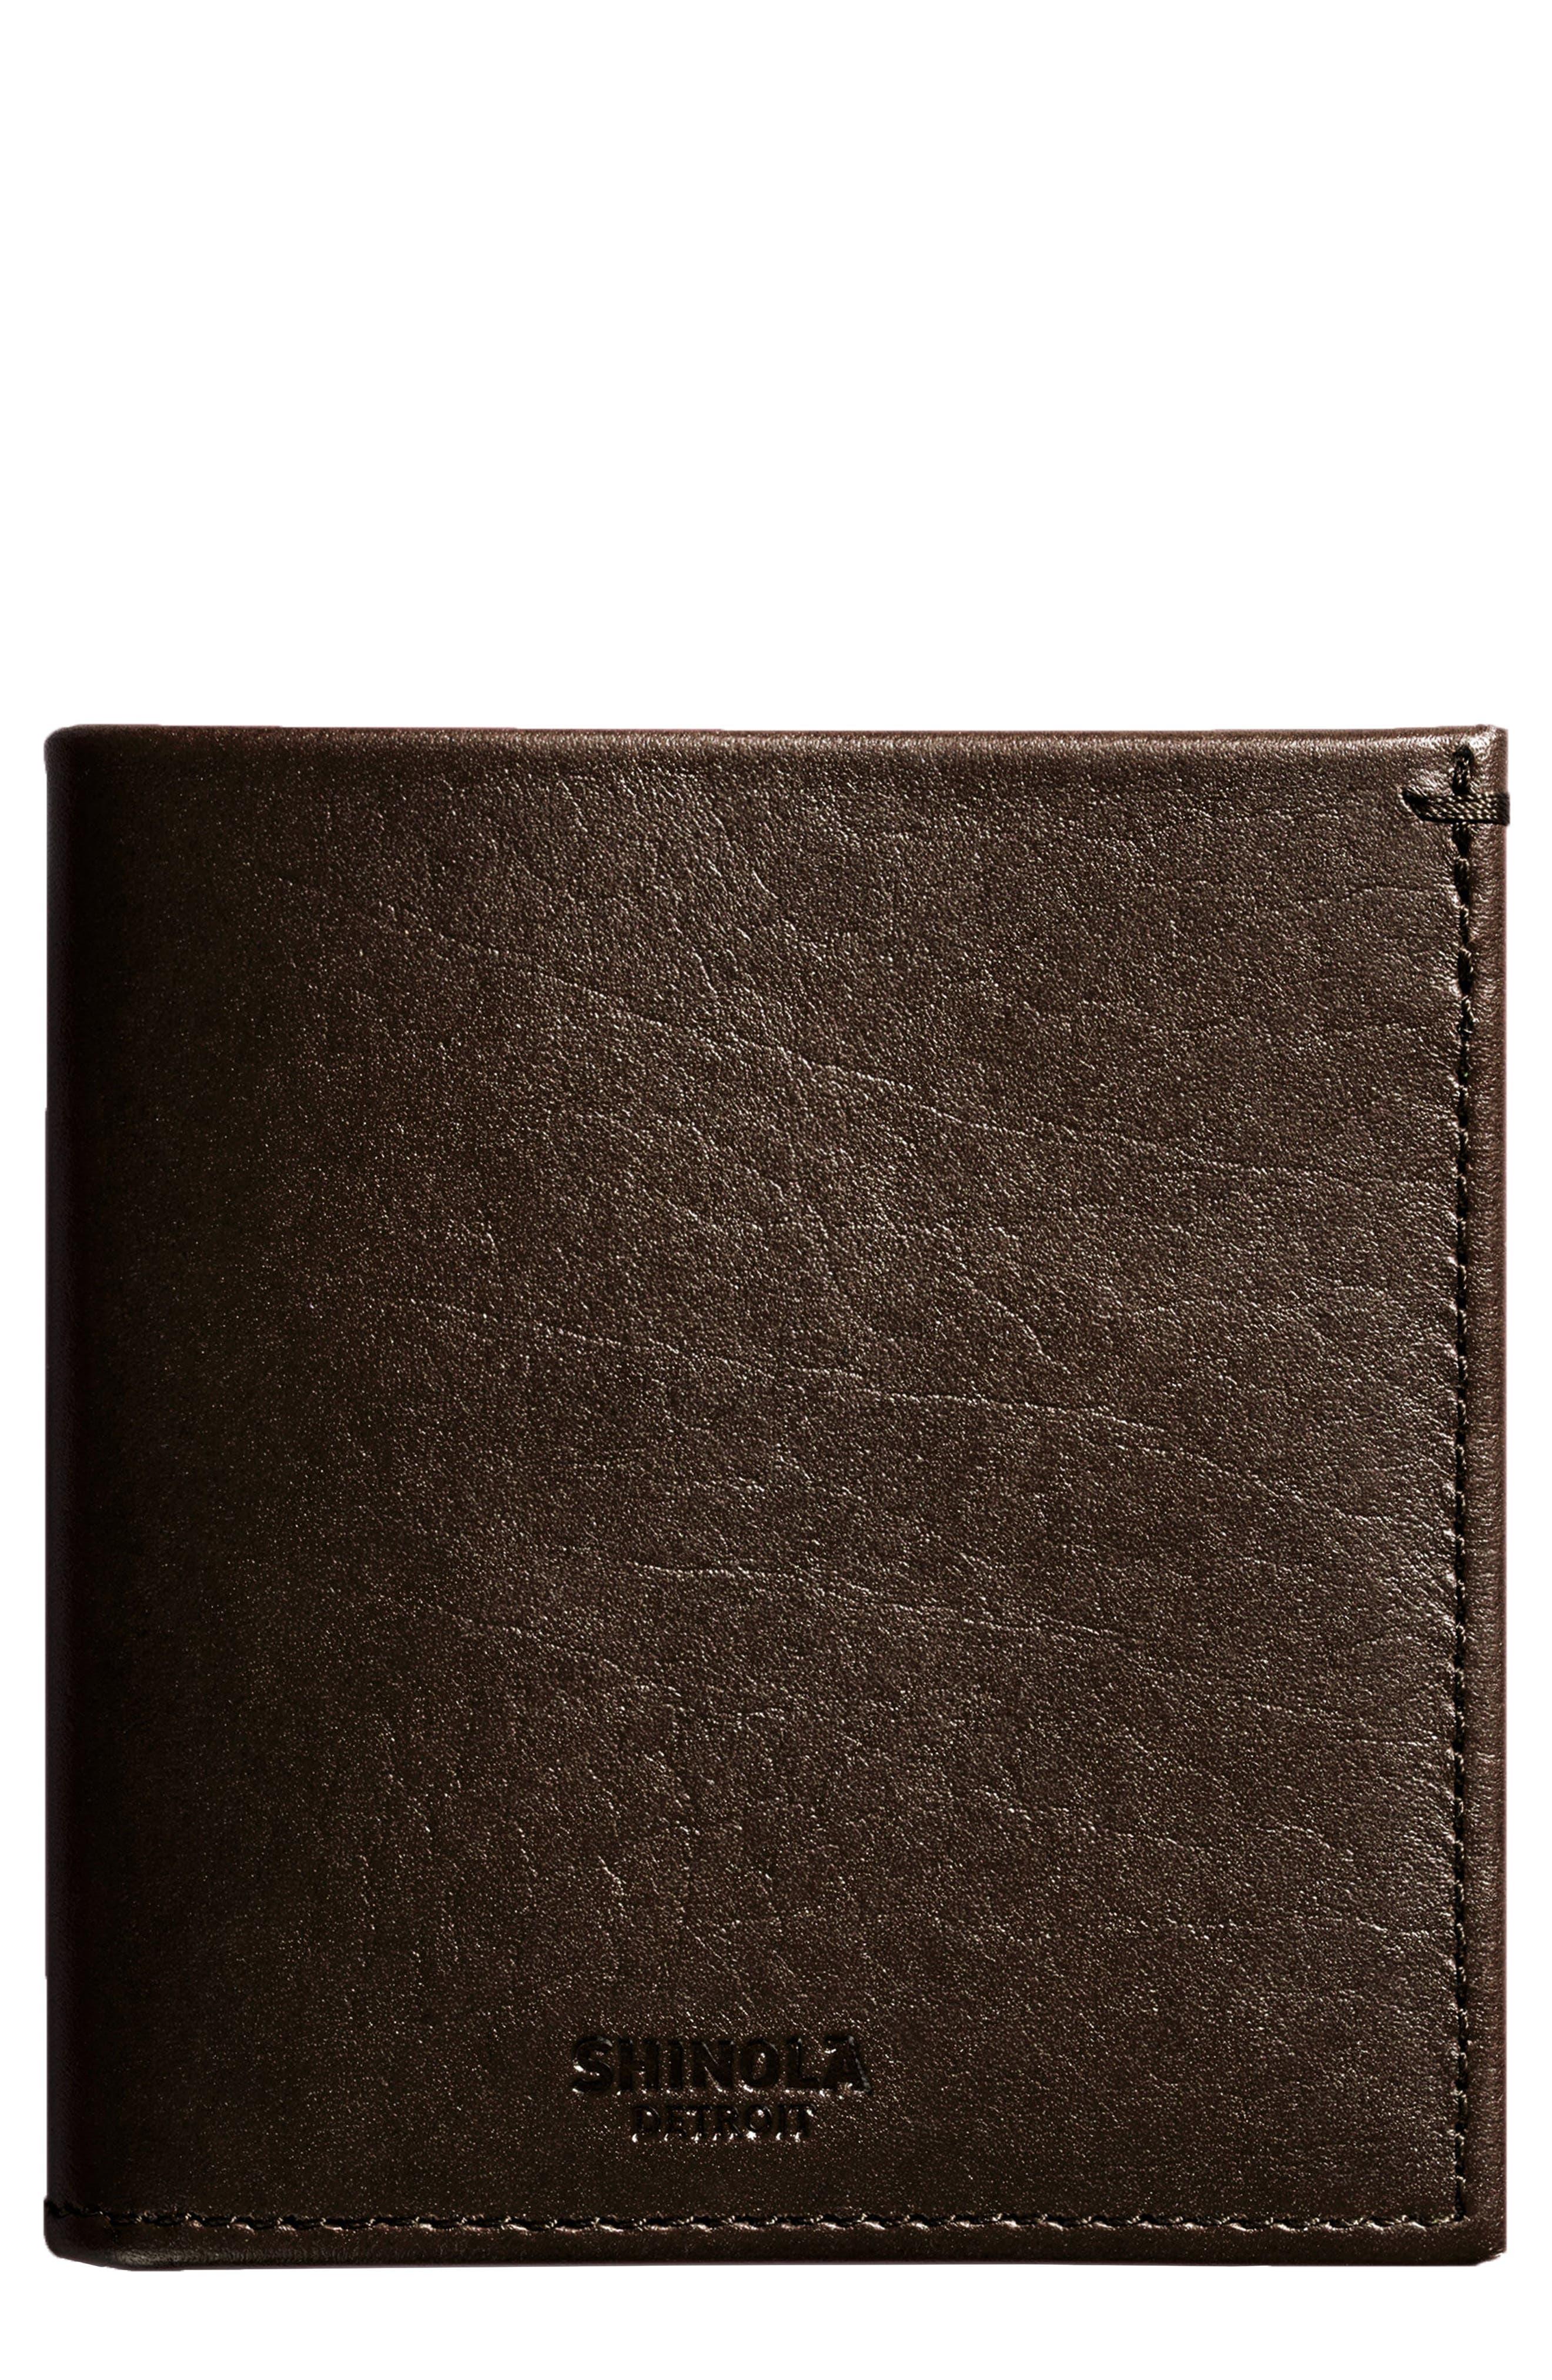 Main Image - Shinola Square Bifold Leather Wallet